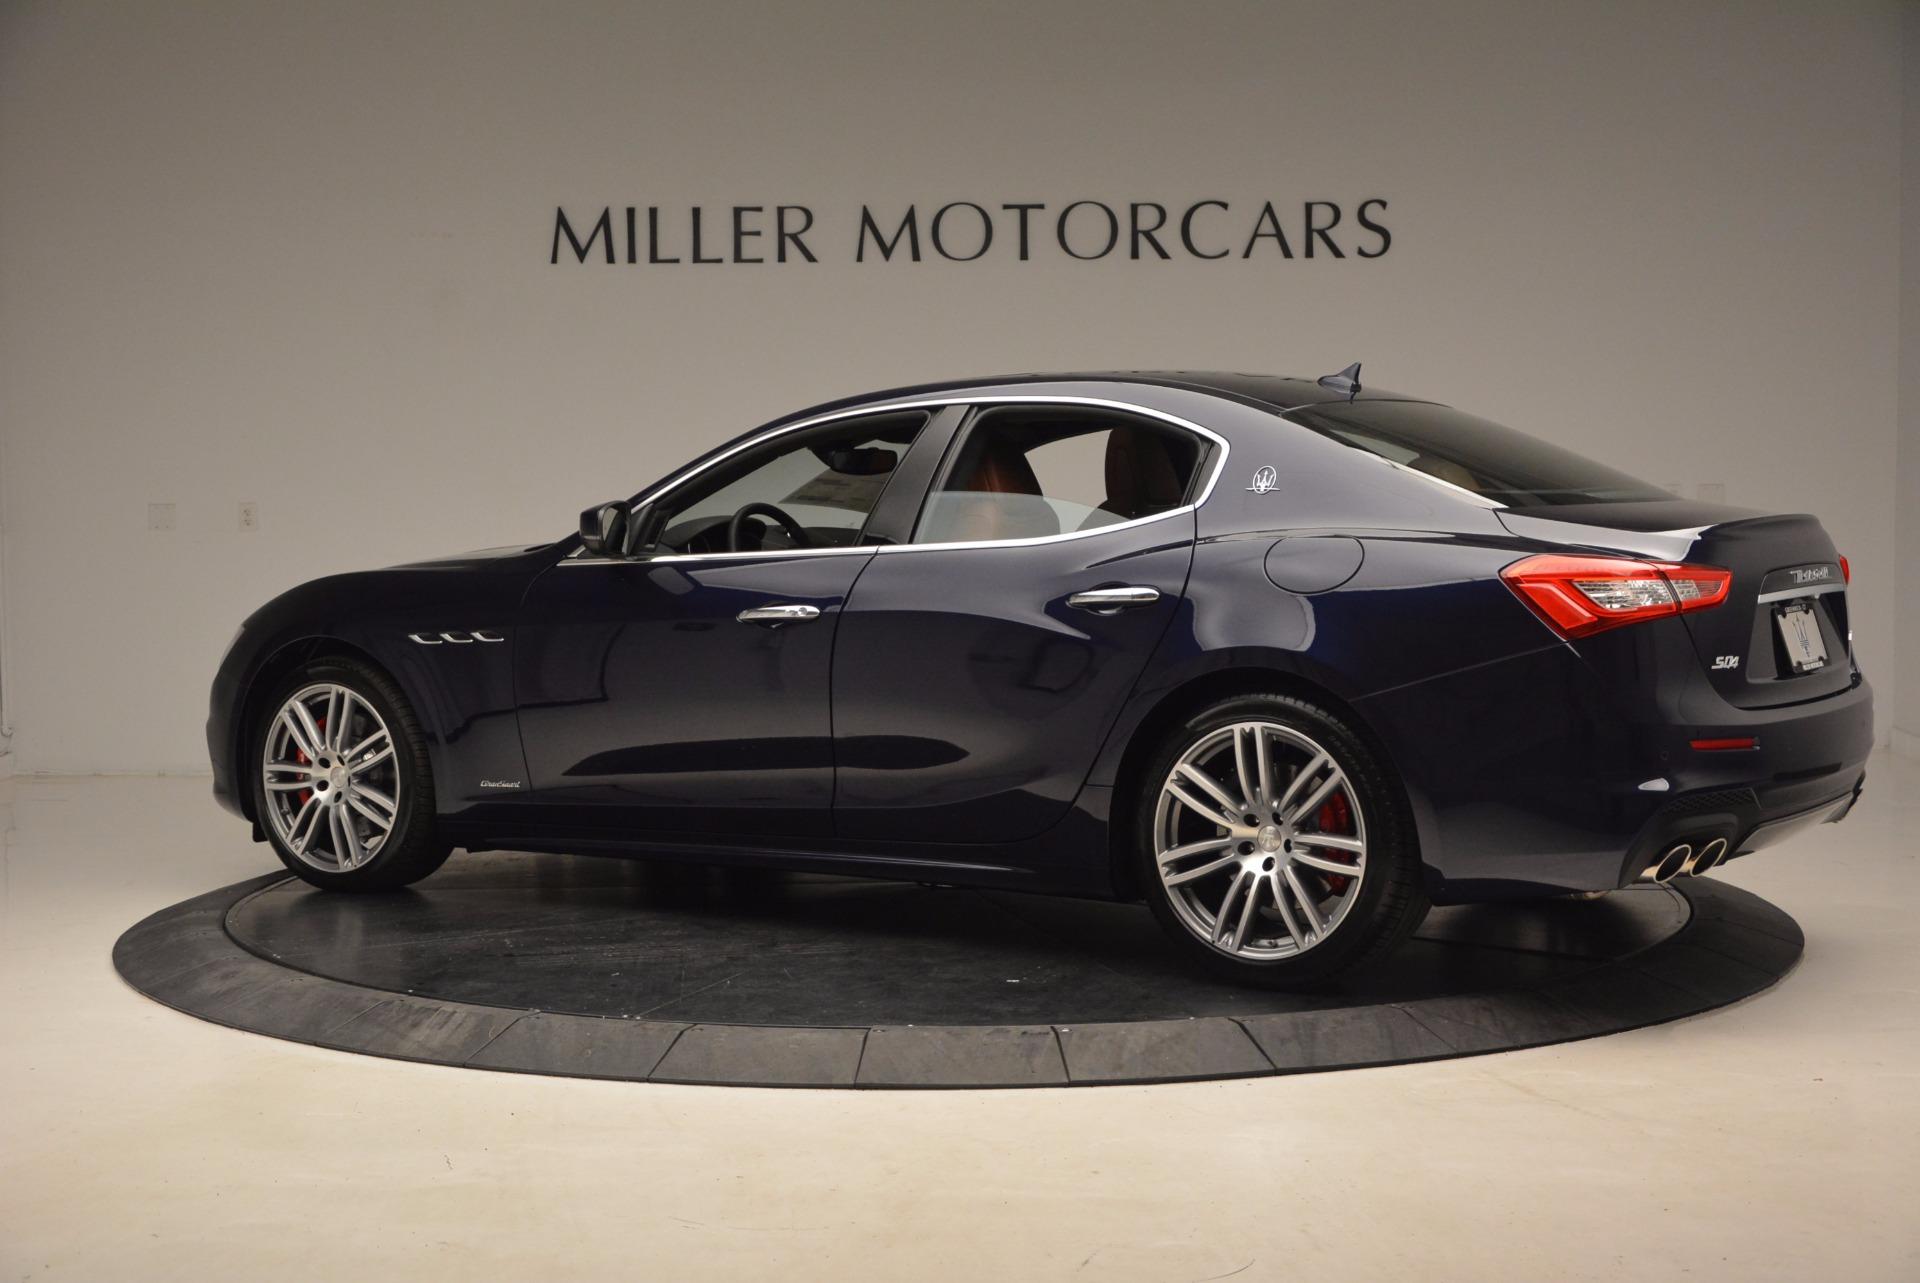 New 2018 Maserati Ghibli S Q4 Gransport For Sale In Greenwich, CT 1562_p4